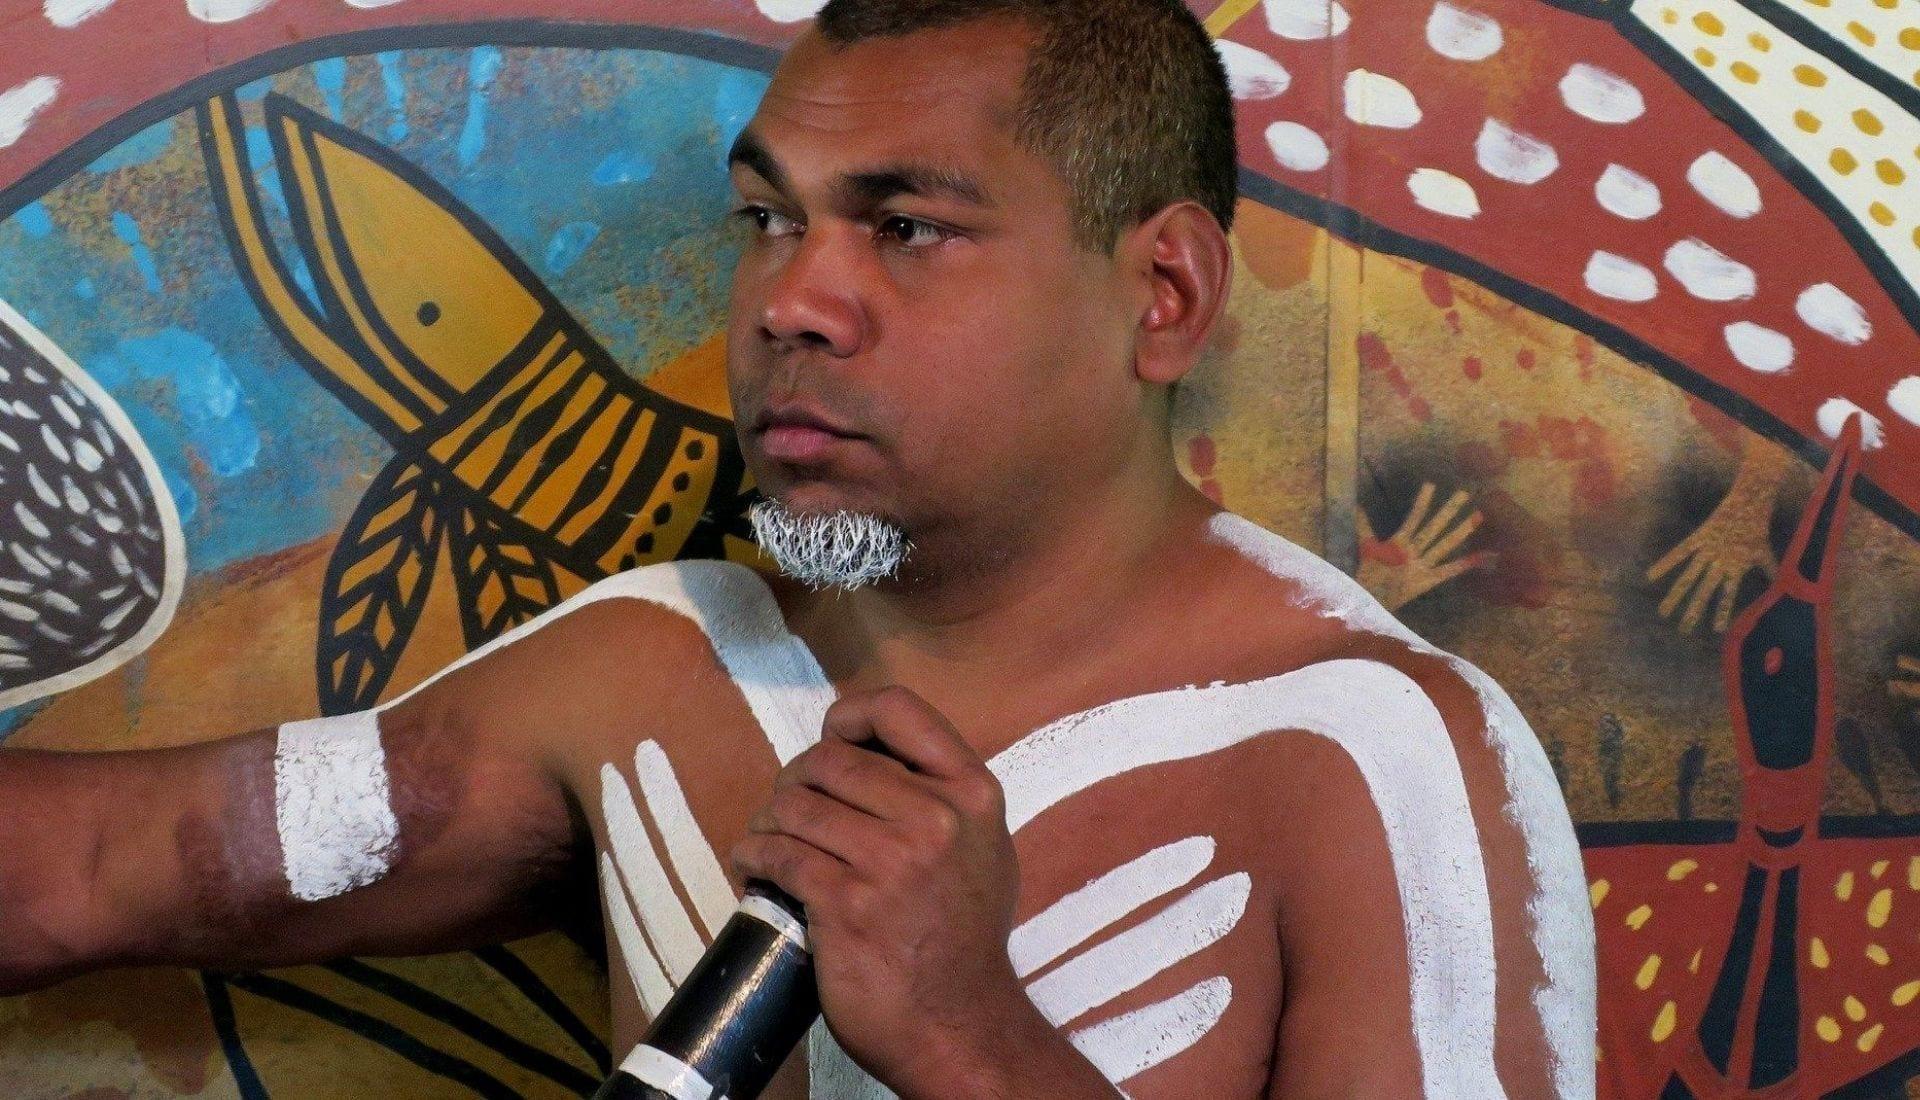 The Aboriginal People of Australia